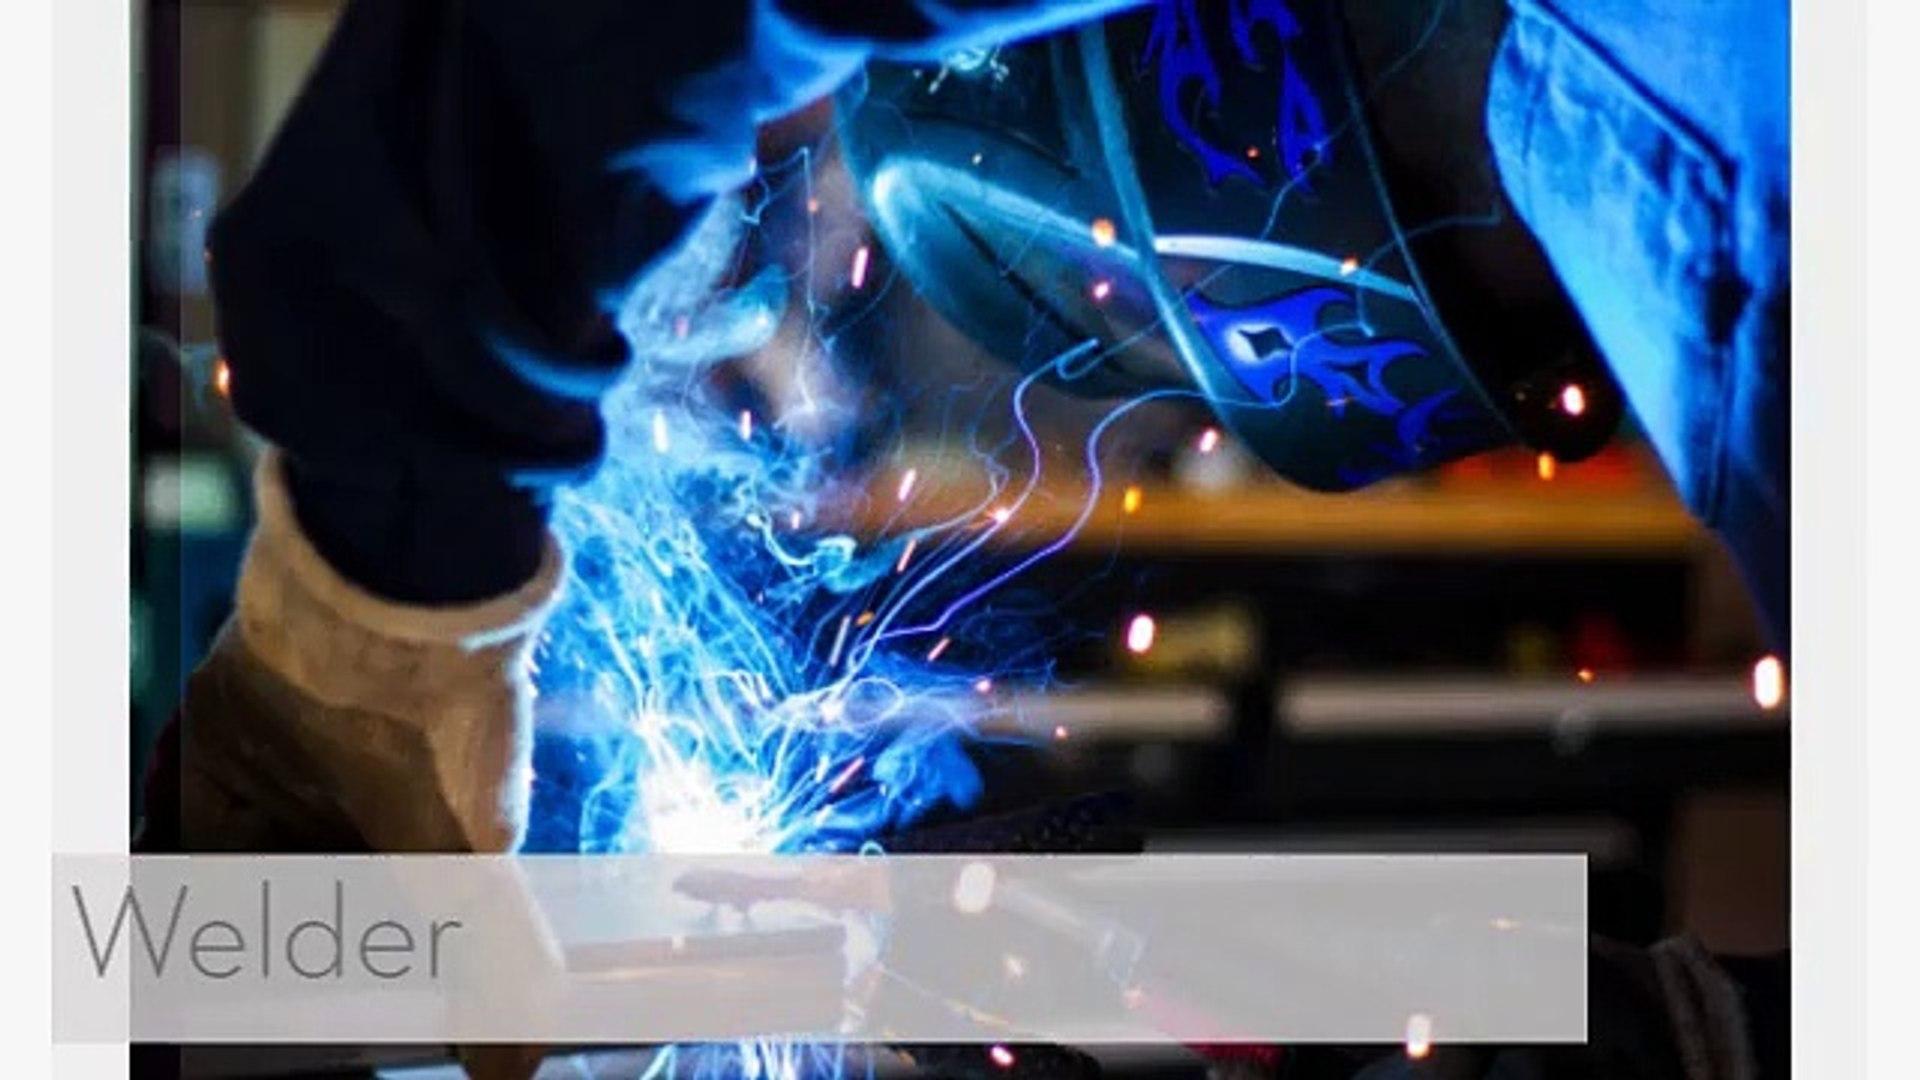 Employment Company in Mesa, AZ   (480) 820-3700